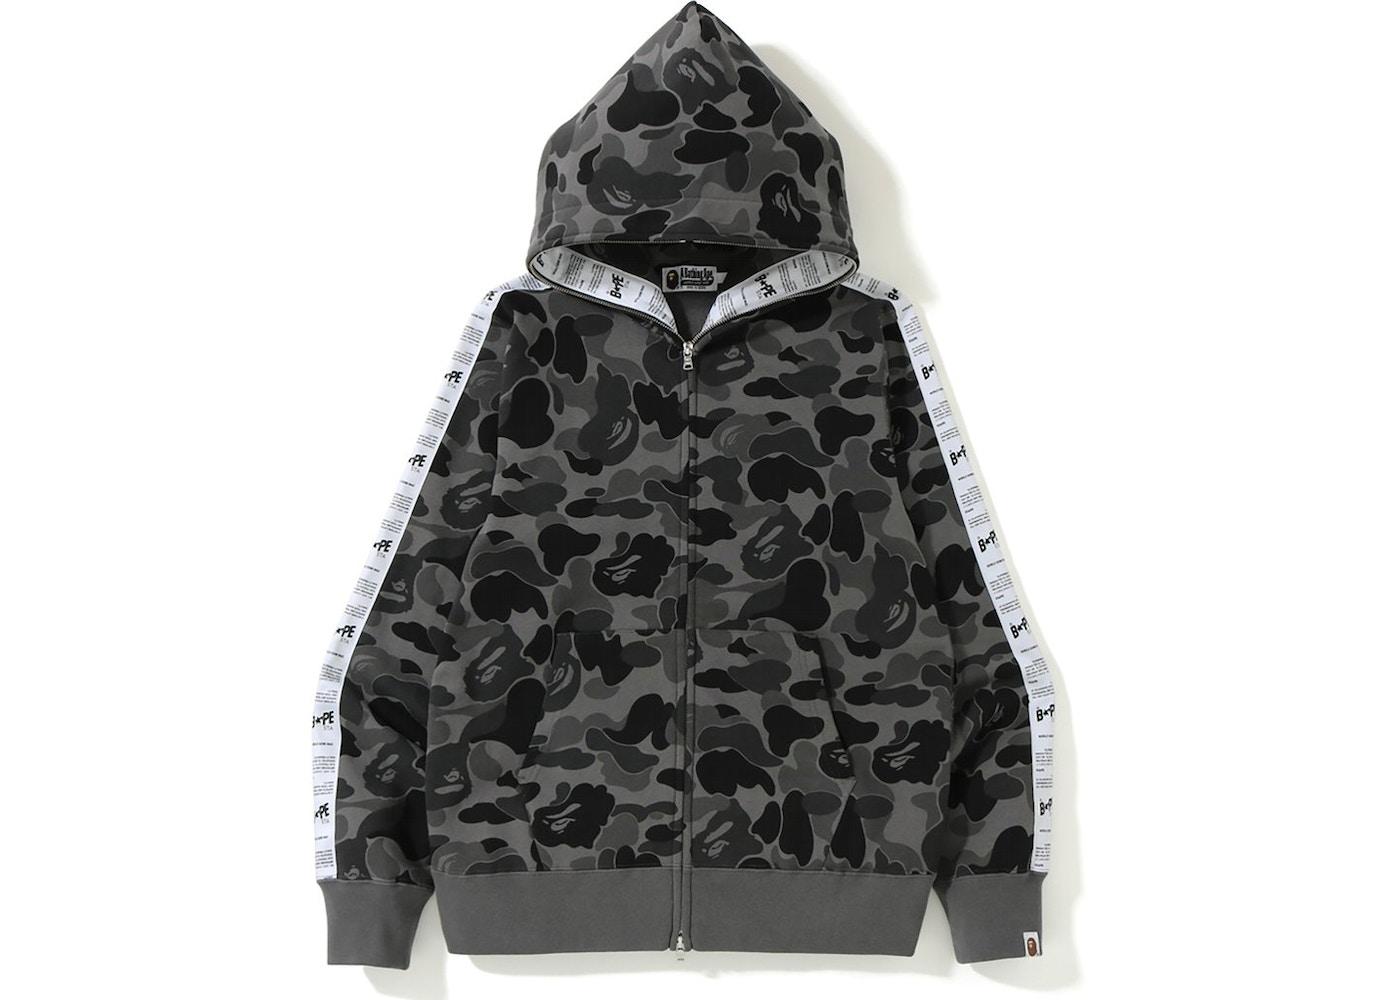 c6f13efa4 Bape Tops/Sweatshirts - Buy & Sell Streetwear